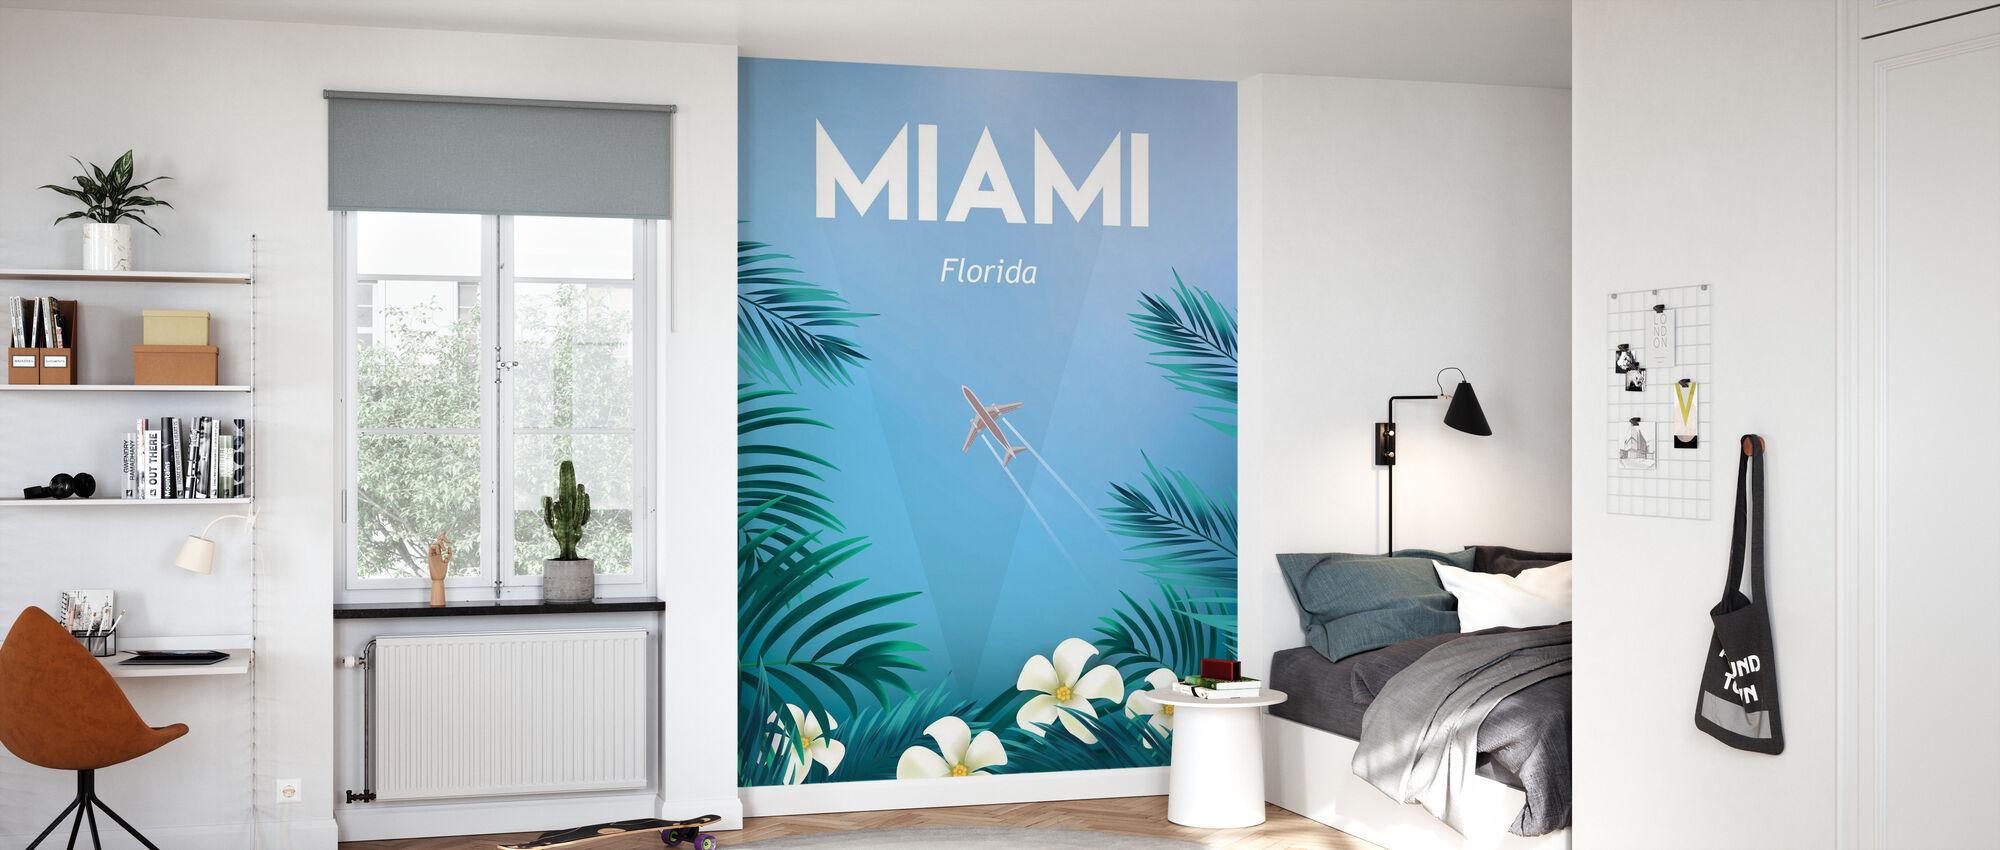 Miami - Tapete - Kinderzimmer